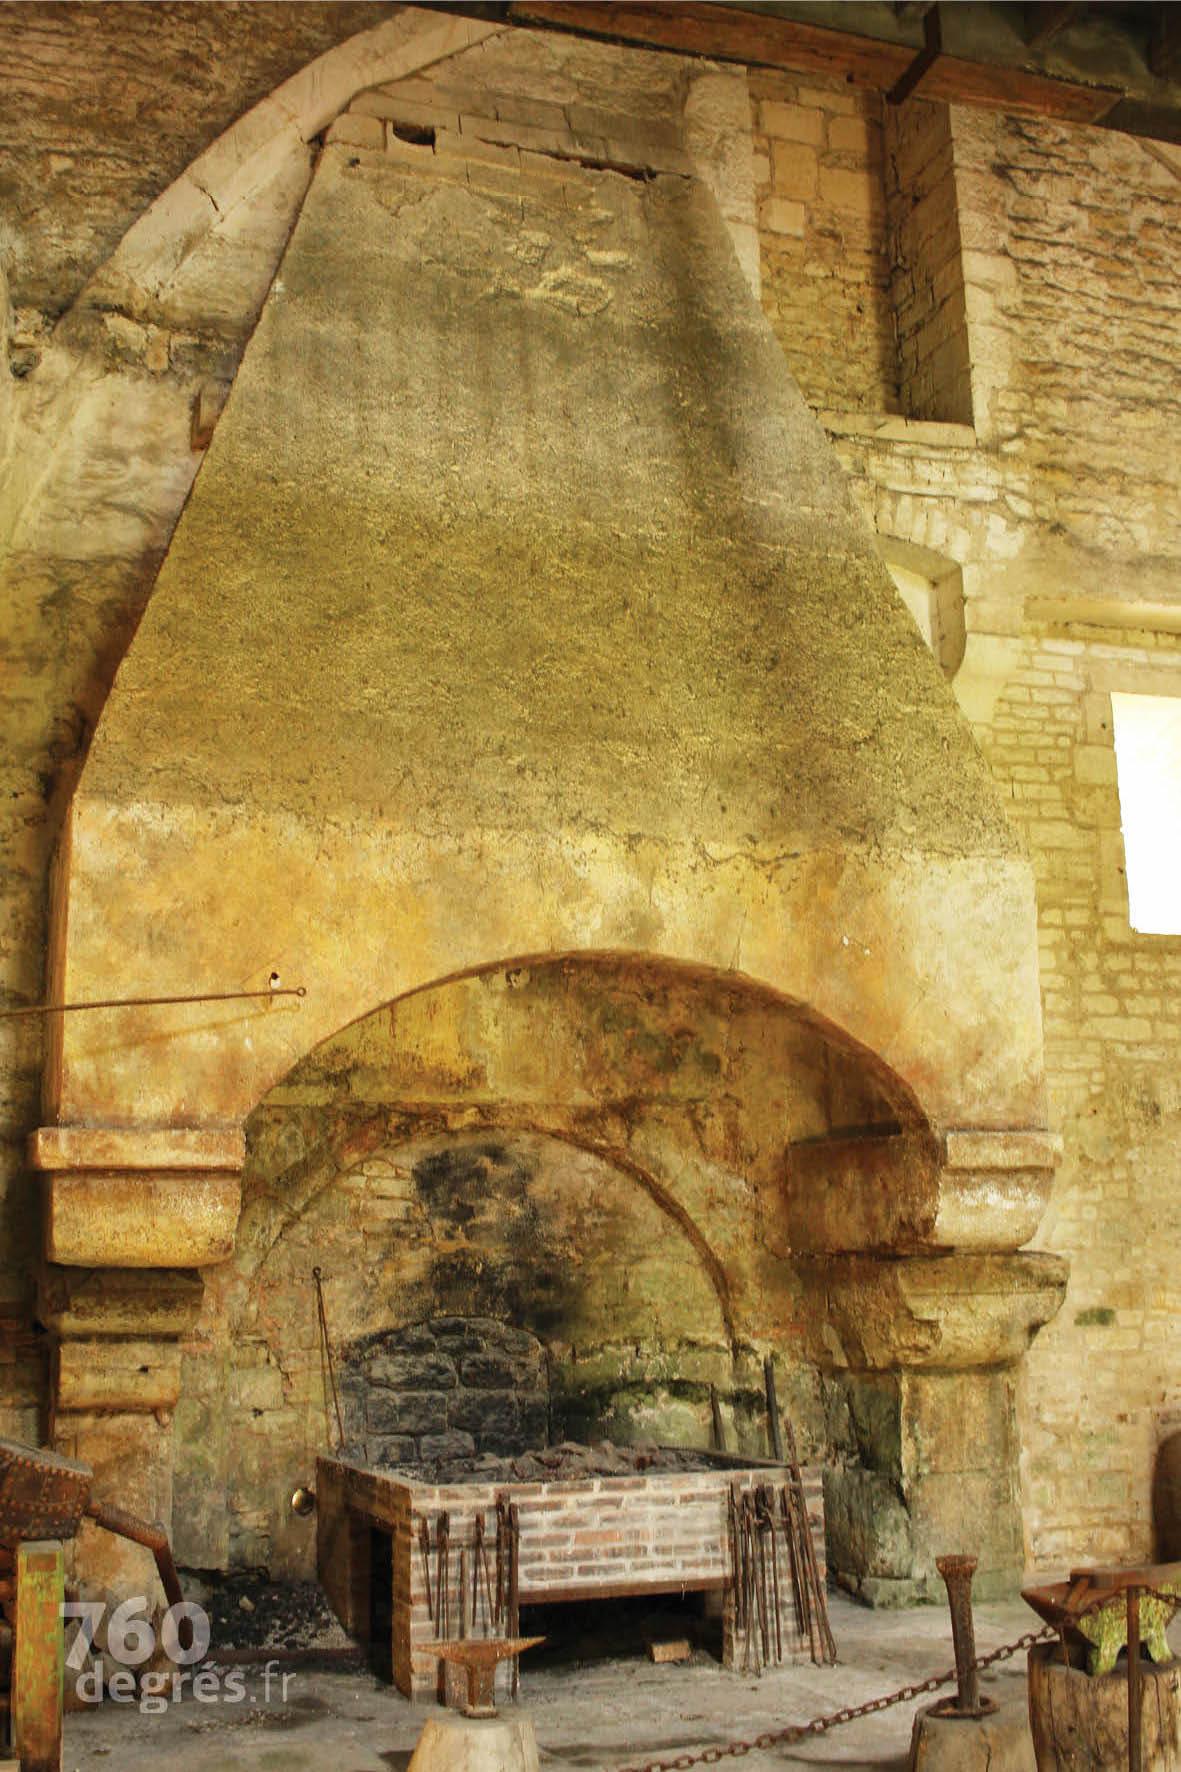 760degres-abbaye-fontenay-14